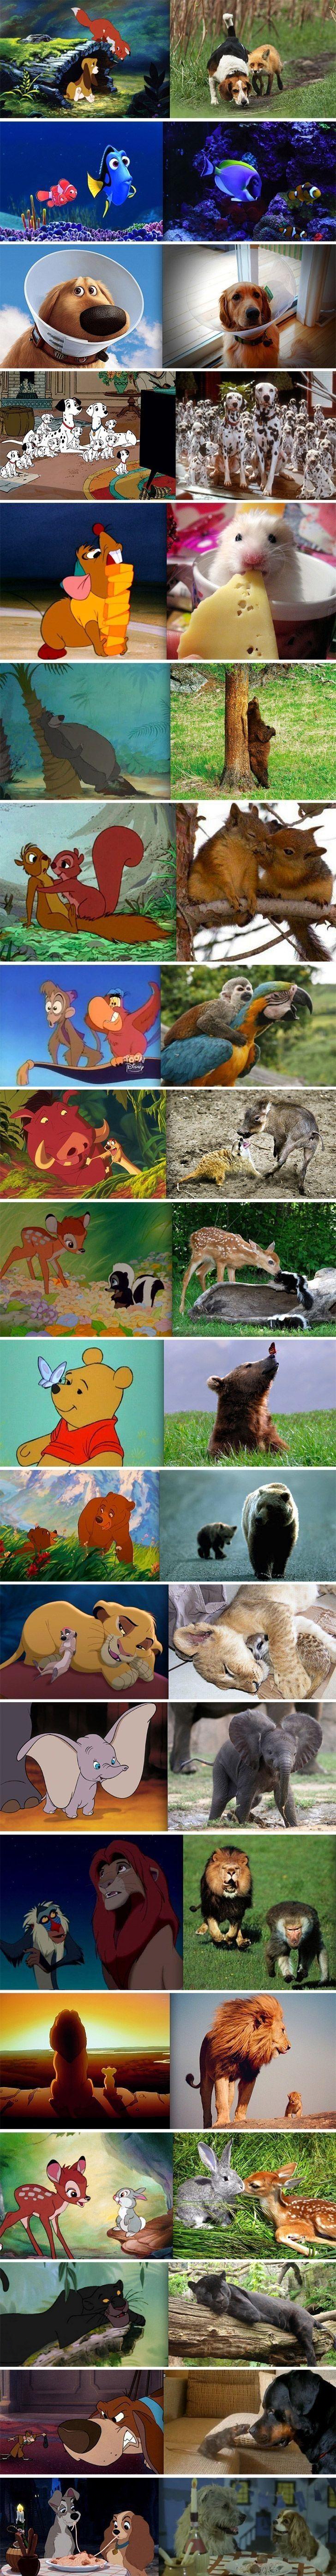 32 best images about Disney pins on Pinterest | Disney ...